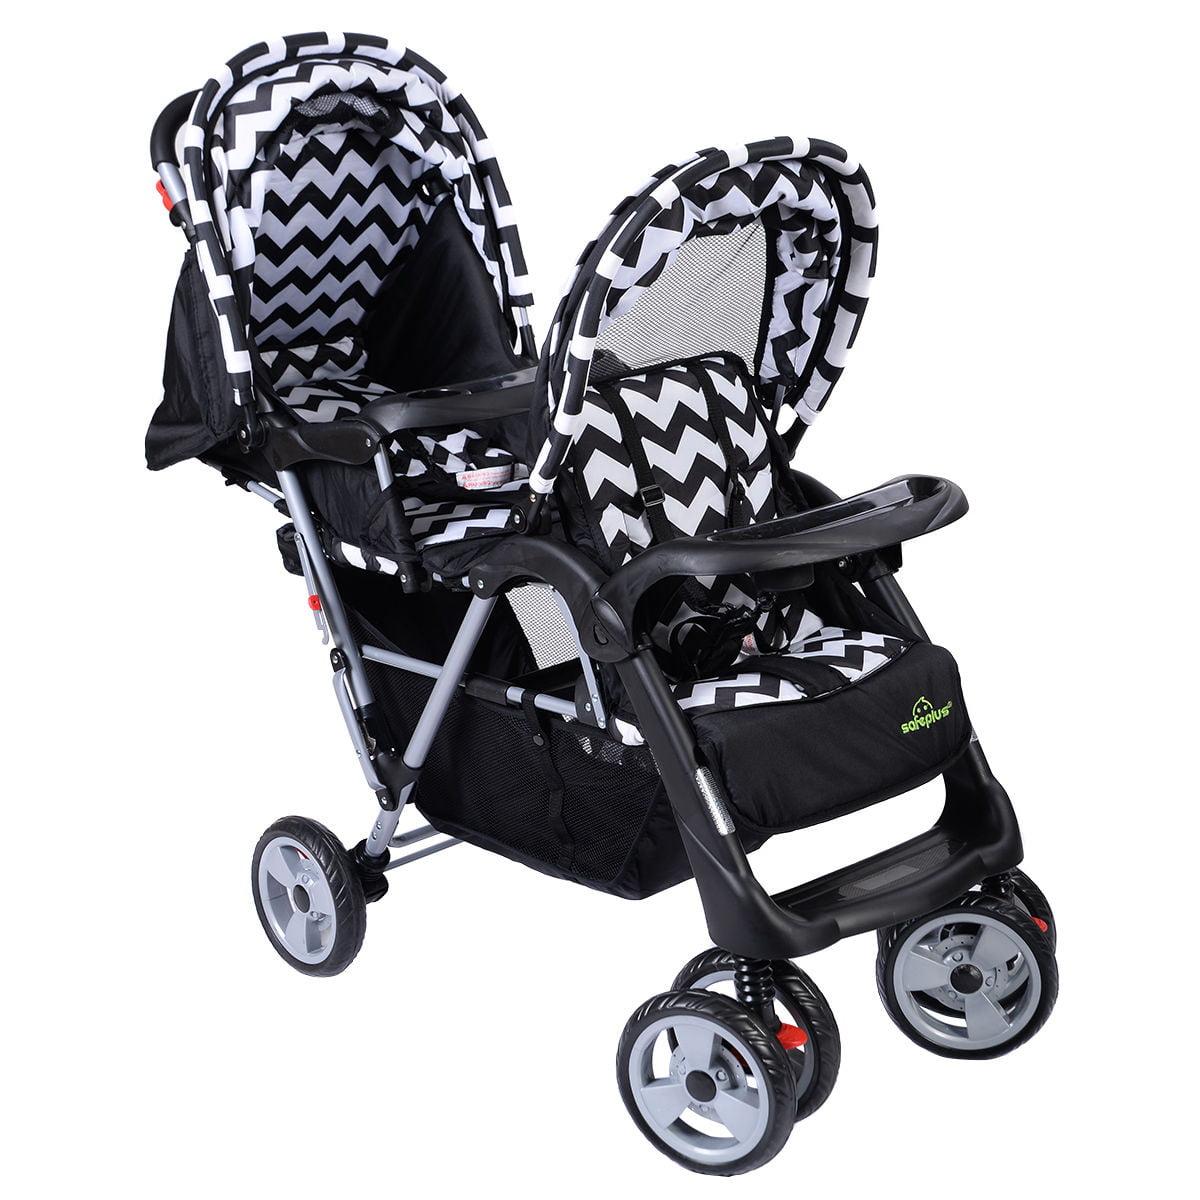 Folding Black Twin Baby Kids Infant Double Stroller Jogger Basket Collapsable